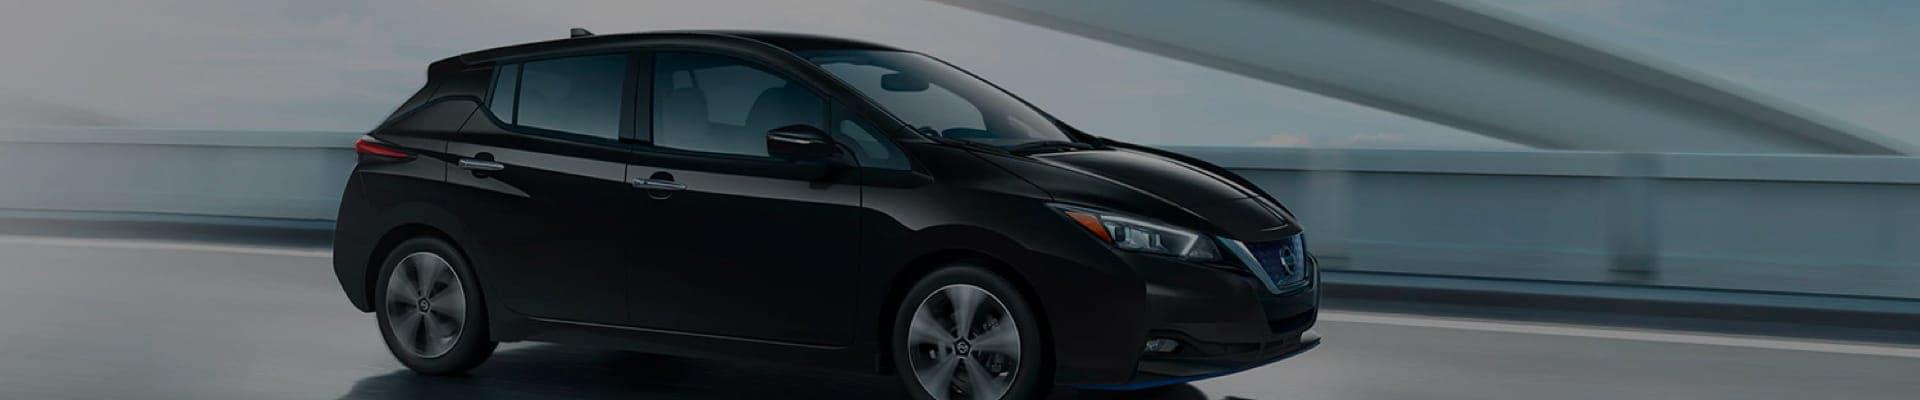 Black Nissan LEAF driving through city at night